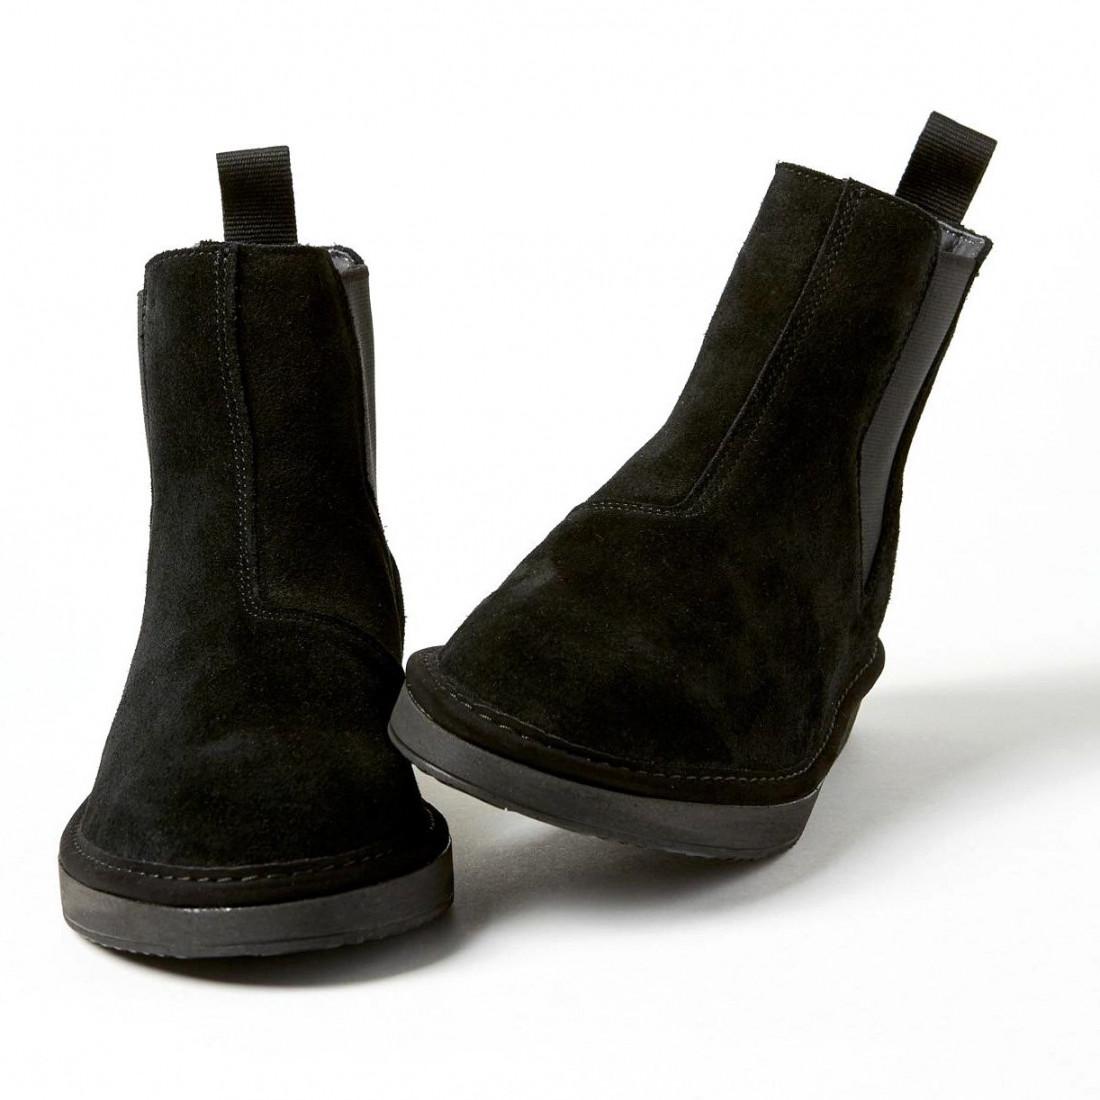 booties woman panchic p01w15003s2a17049 7625